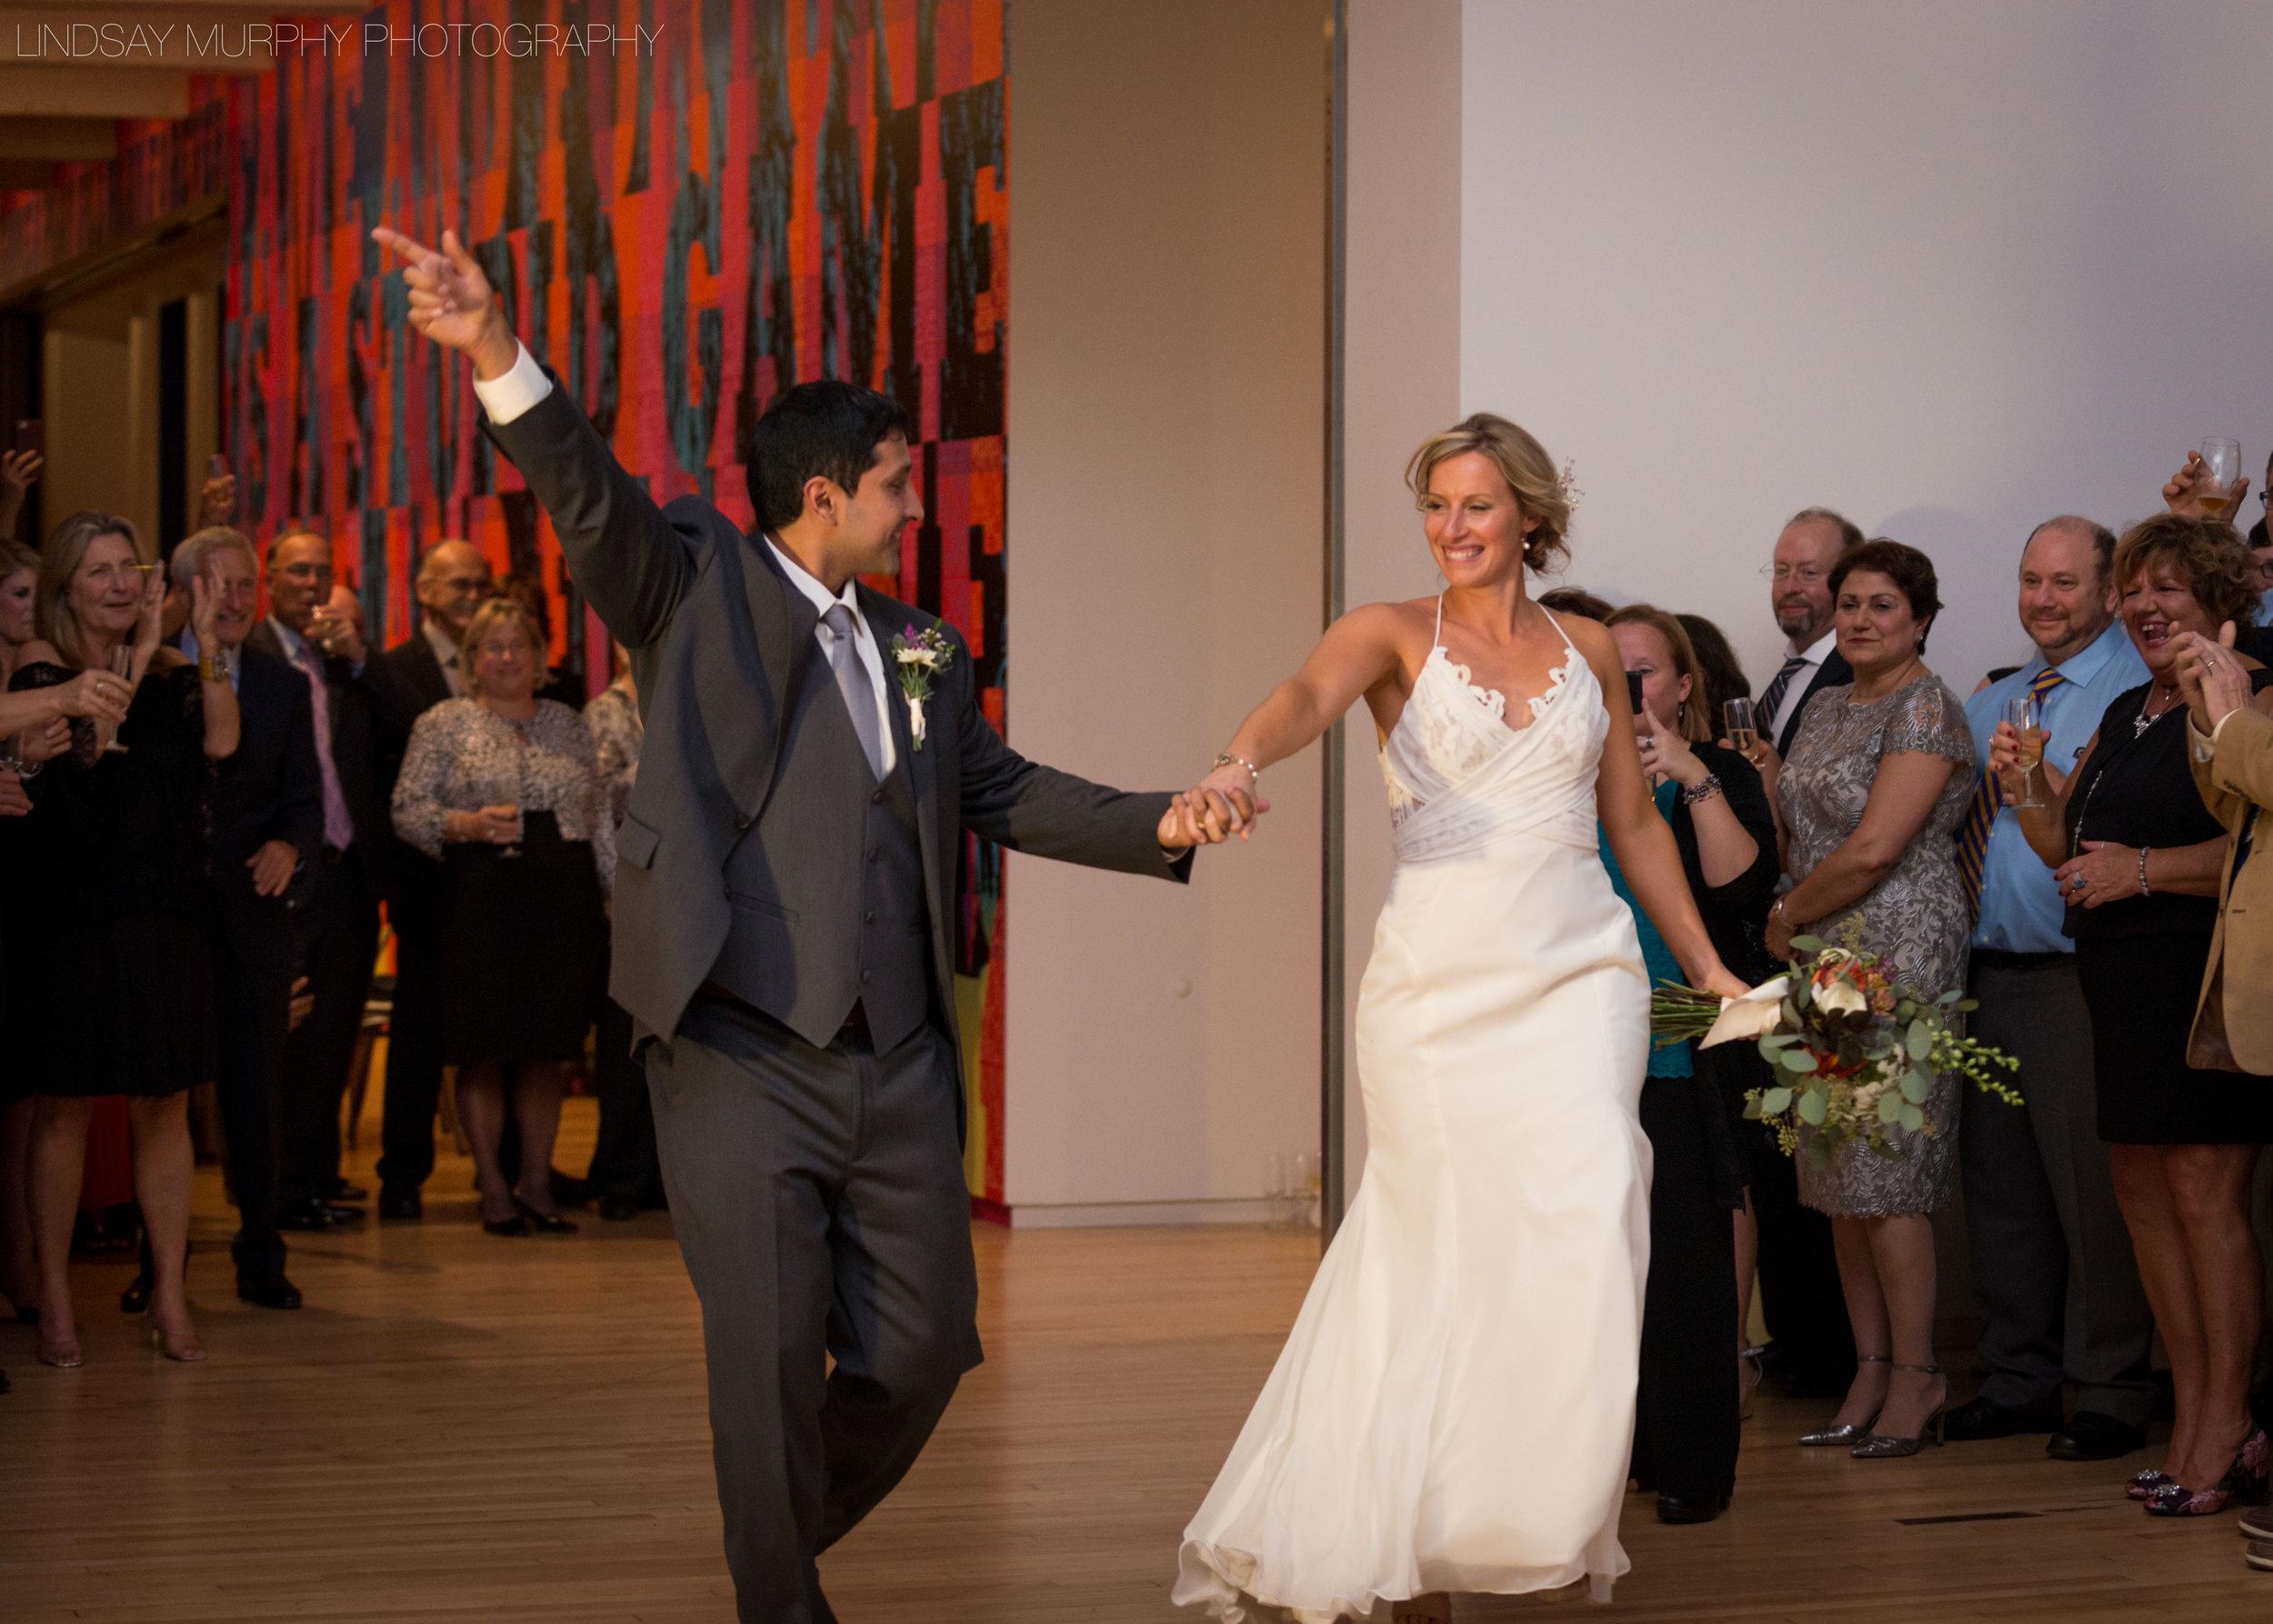 New_England_wedding-35.jpg